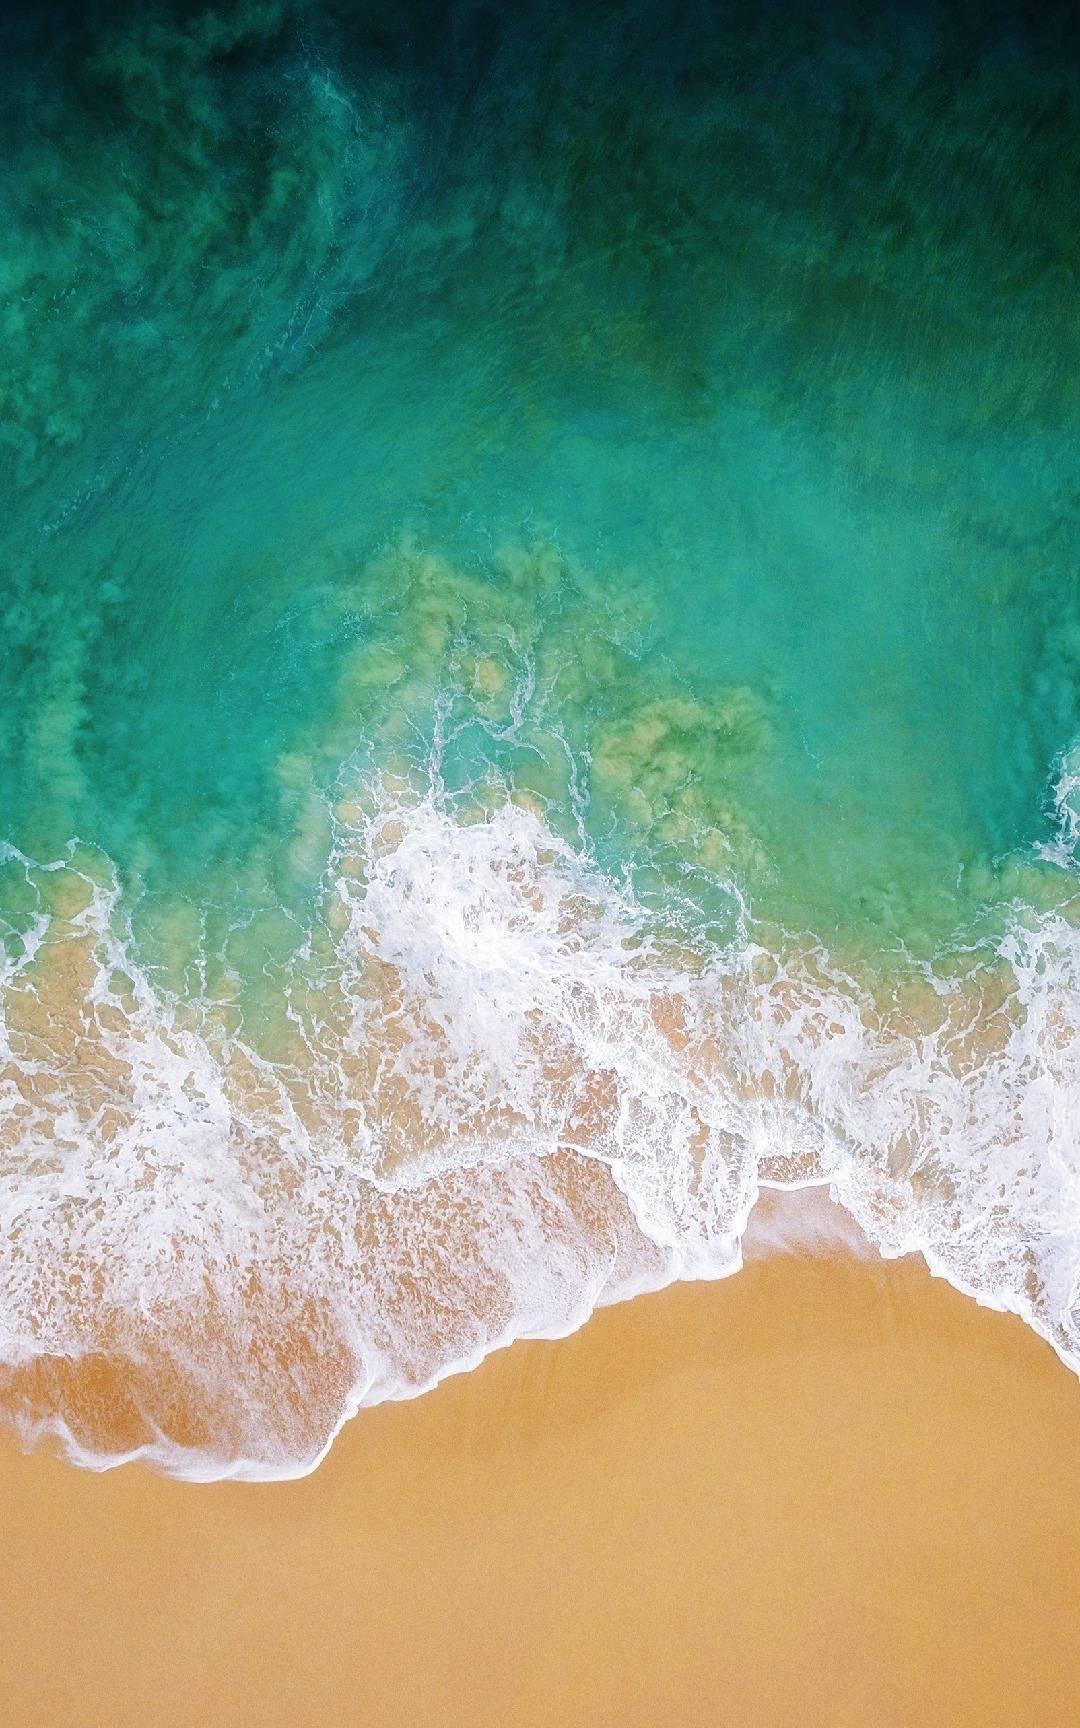 iphone x wallpaper hd 1080p